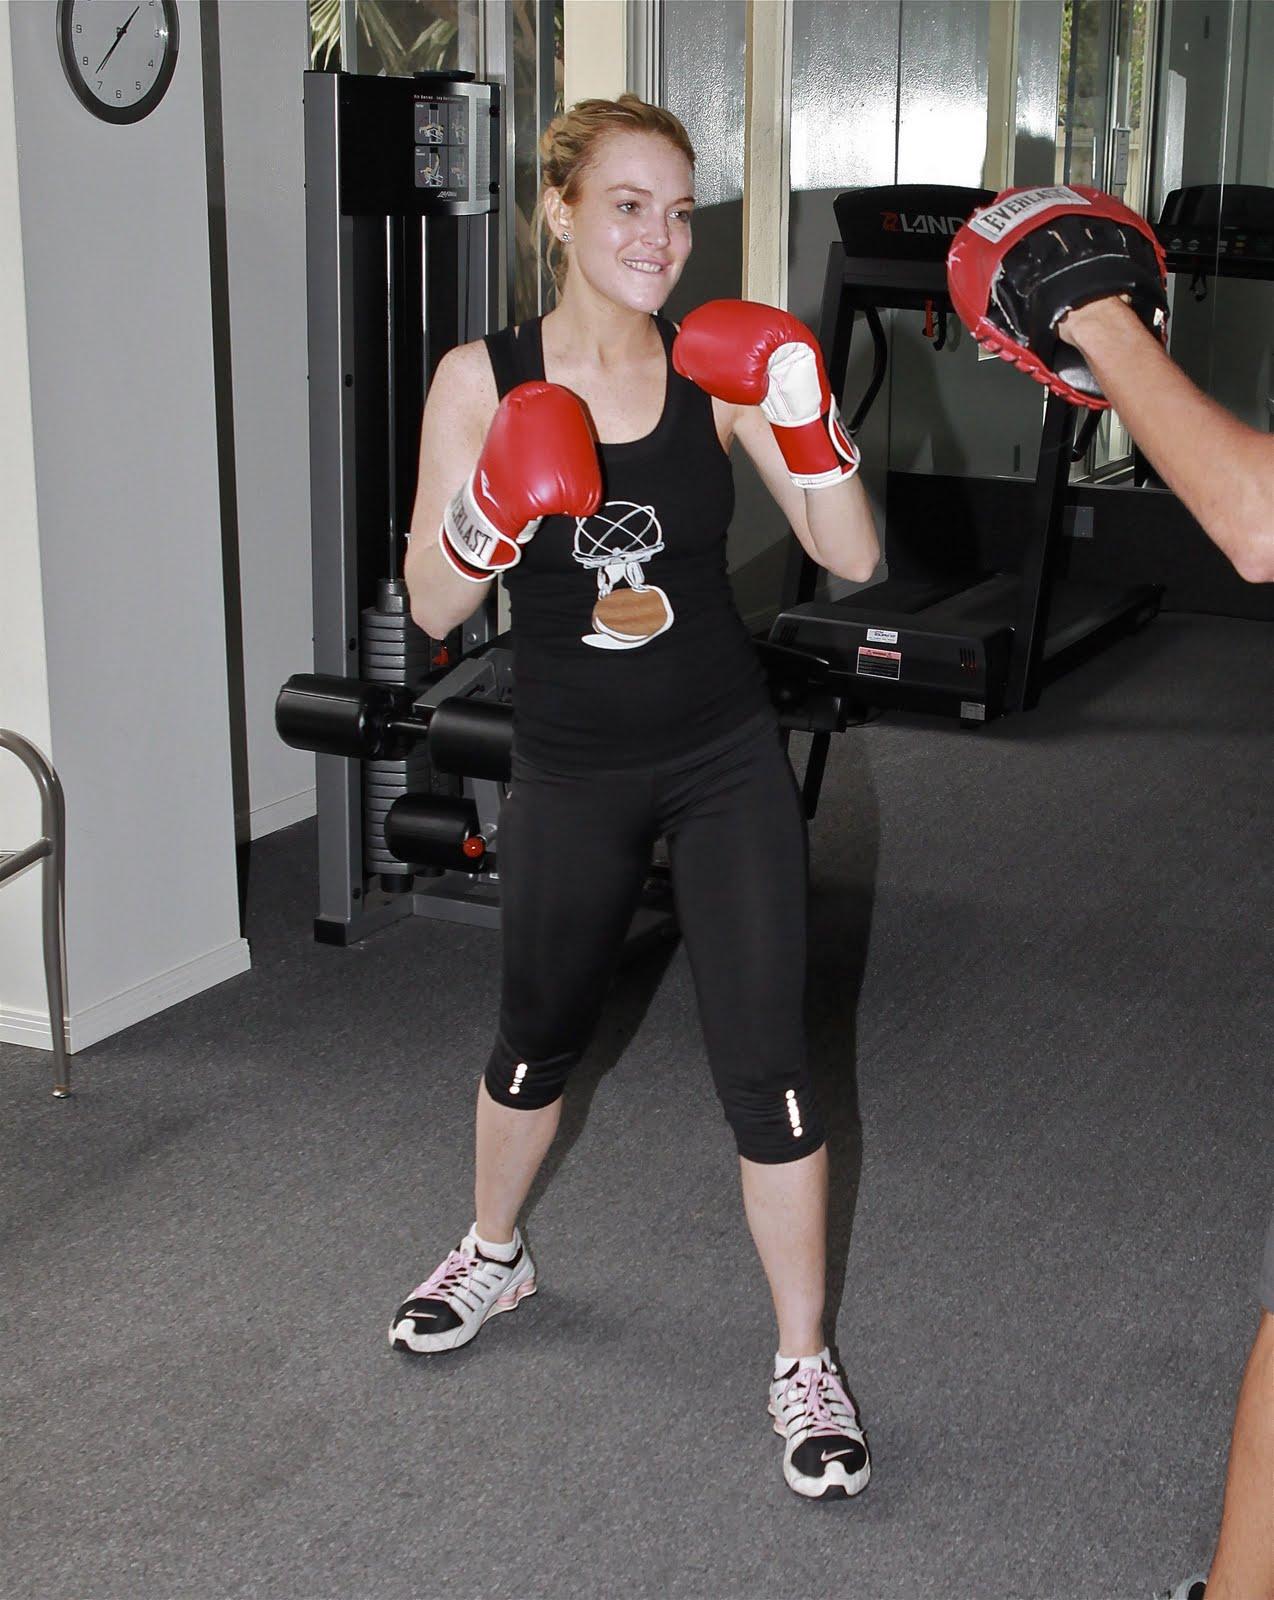 http://1.bp.blogspot.com/_8Fb4o_Cat9k/TIkSZiUL0kI/AAAAAAAALHw/YFPPbo-0u3c/s1600/September+8+-+Lindsay+Lohan+Kickboxing+at+a+Gym+in+Hollywood+06.jpg